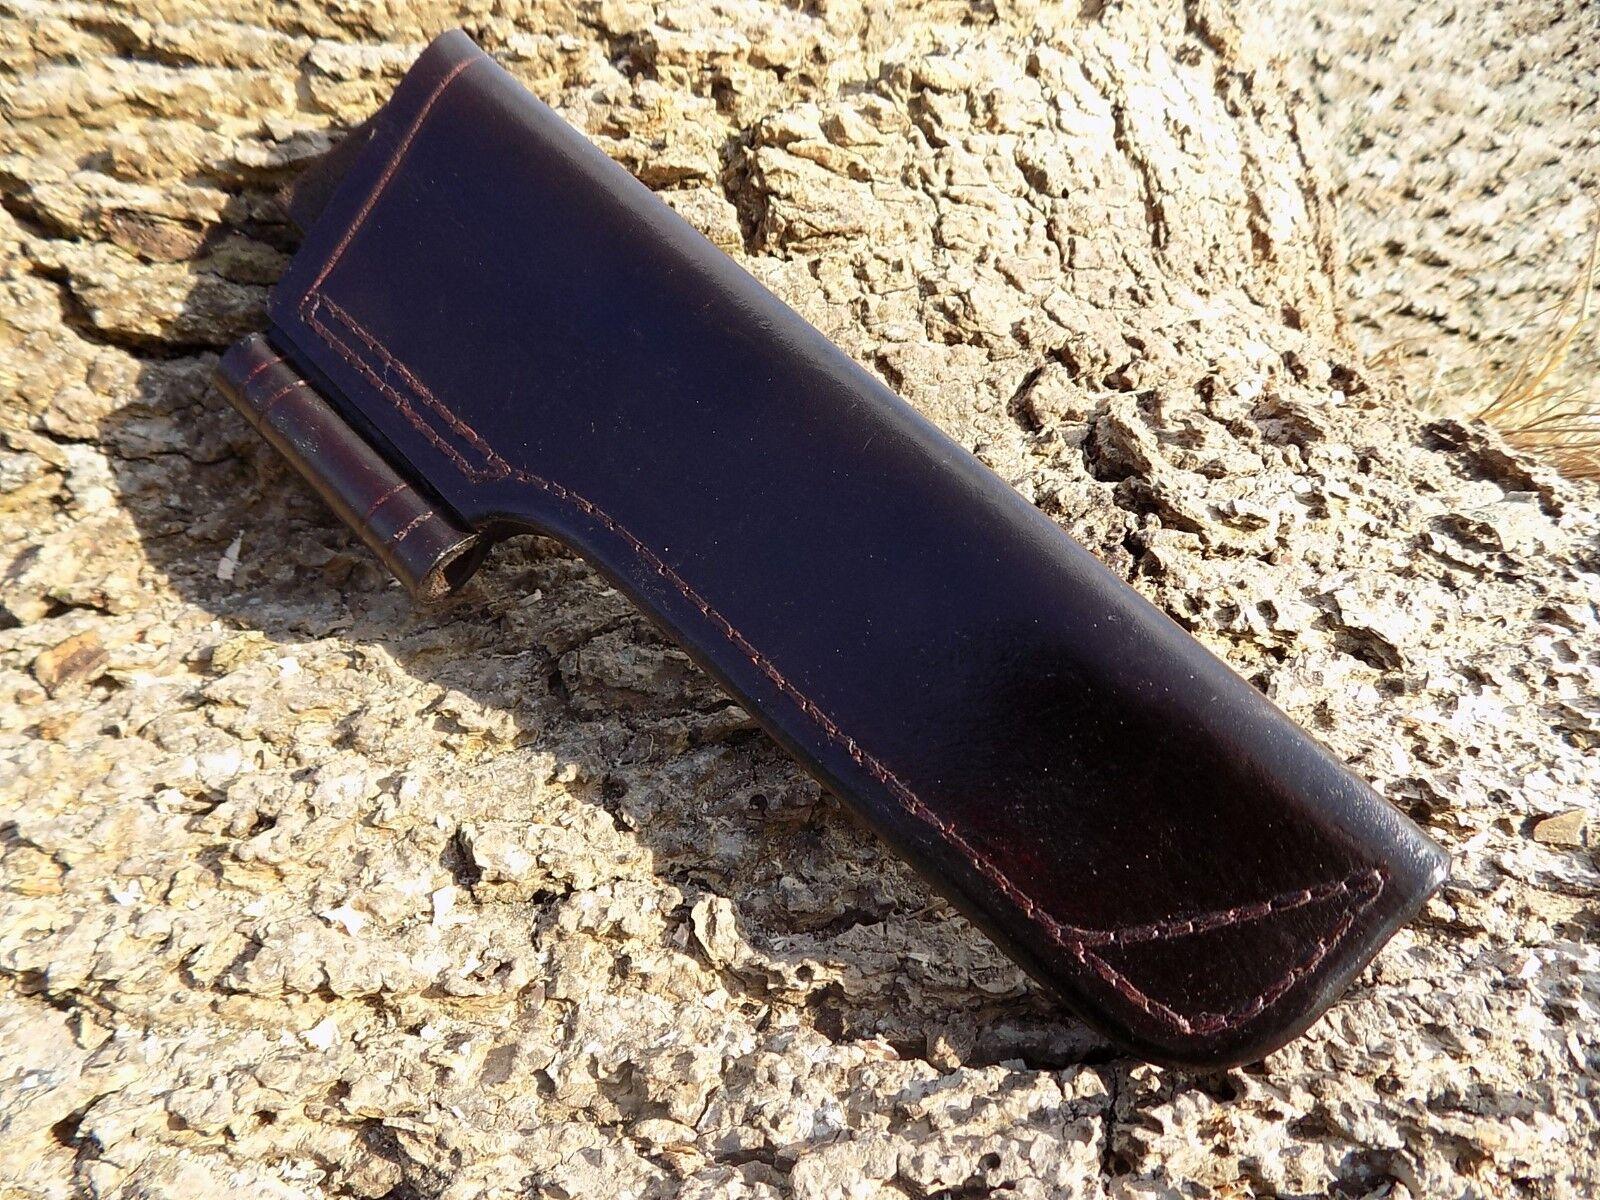 Handmade leather Bushcraft  Knife Sheath  Dark Brown with firesteel holder  authentic quality